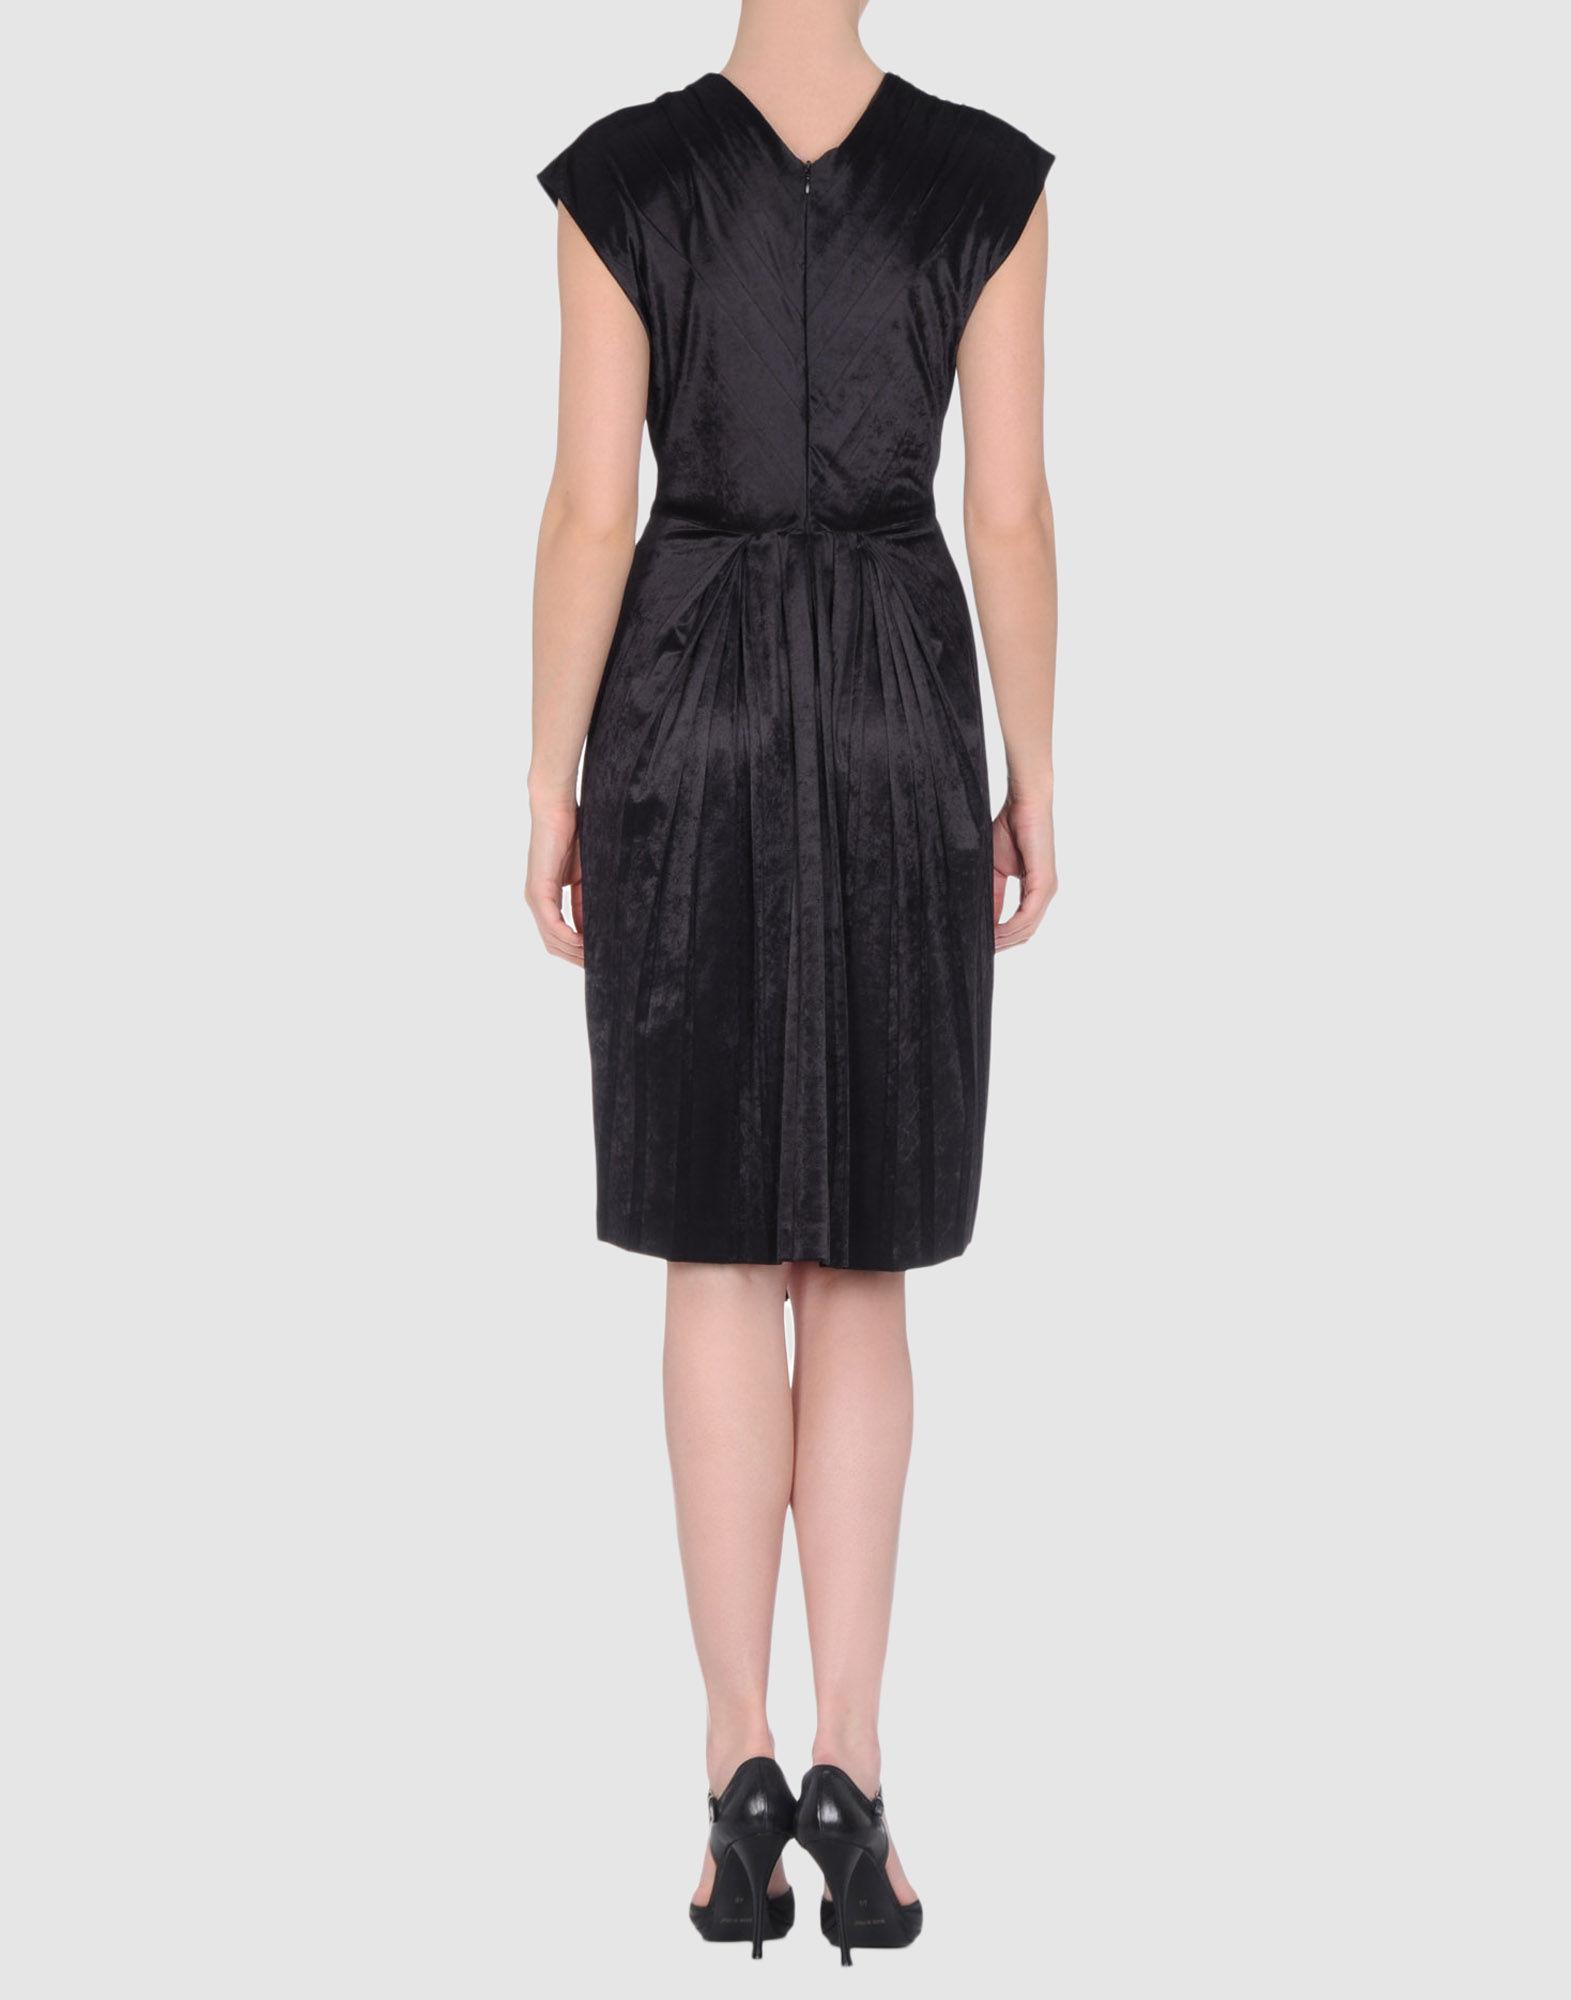 34206714BI 14 r - Βραδυνα Φορεματα Yves Saint Laurent Rive Gauche Κωδ.13